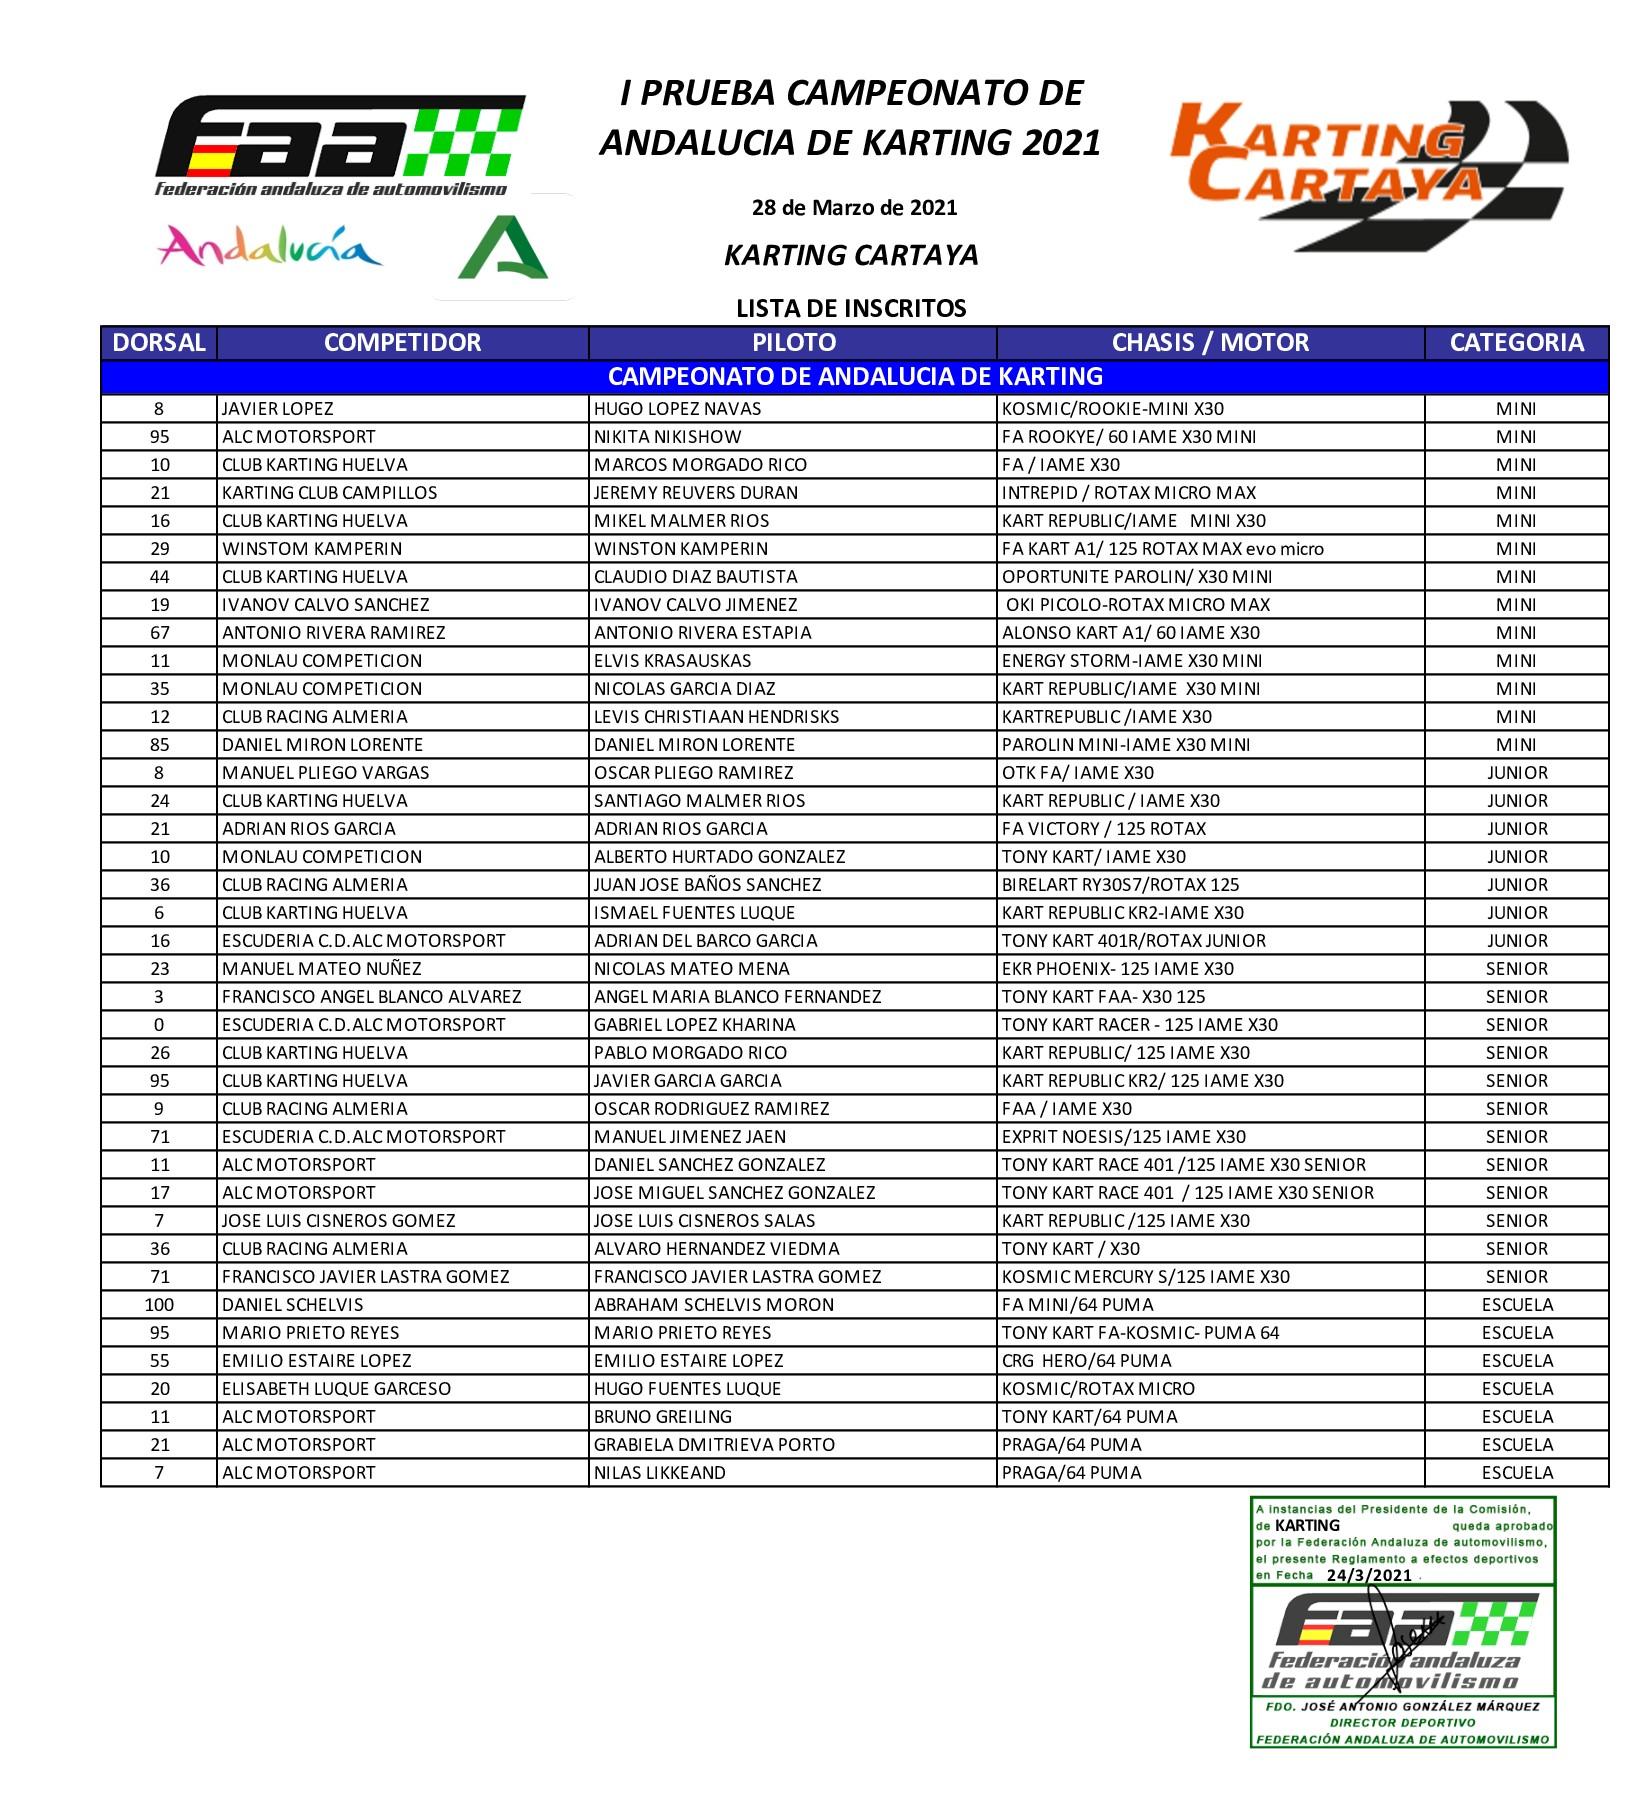 Inscritos Campeonato Andalucía Karting - Cartaya